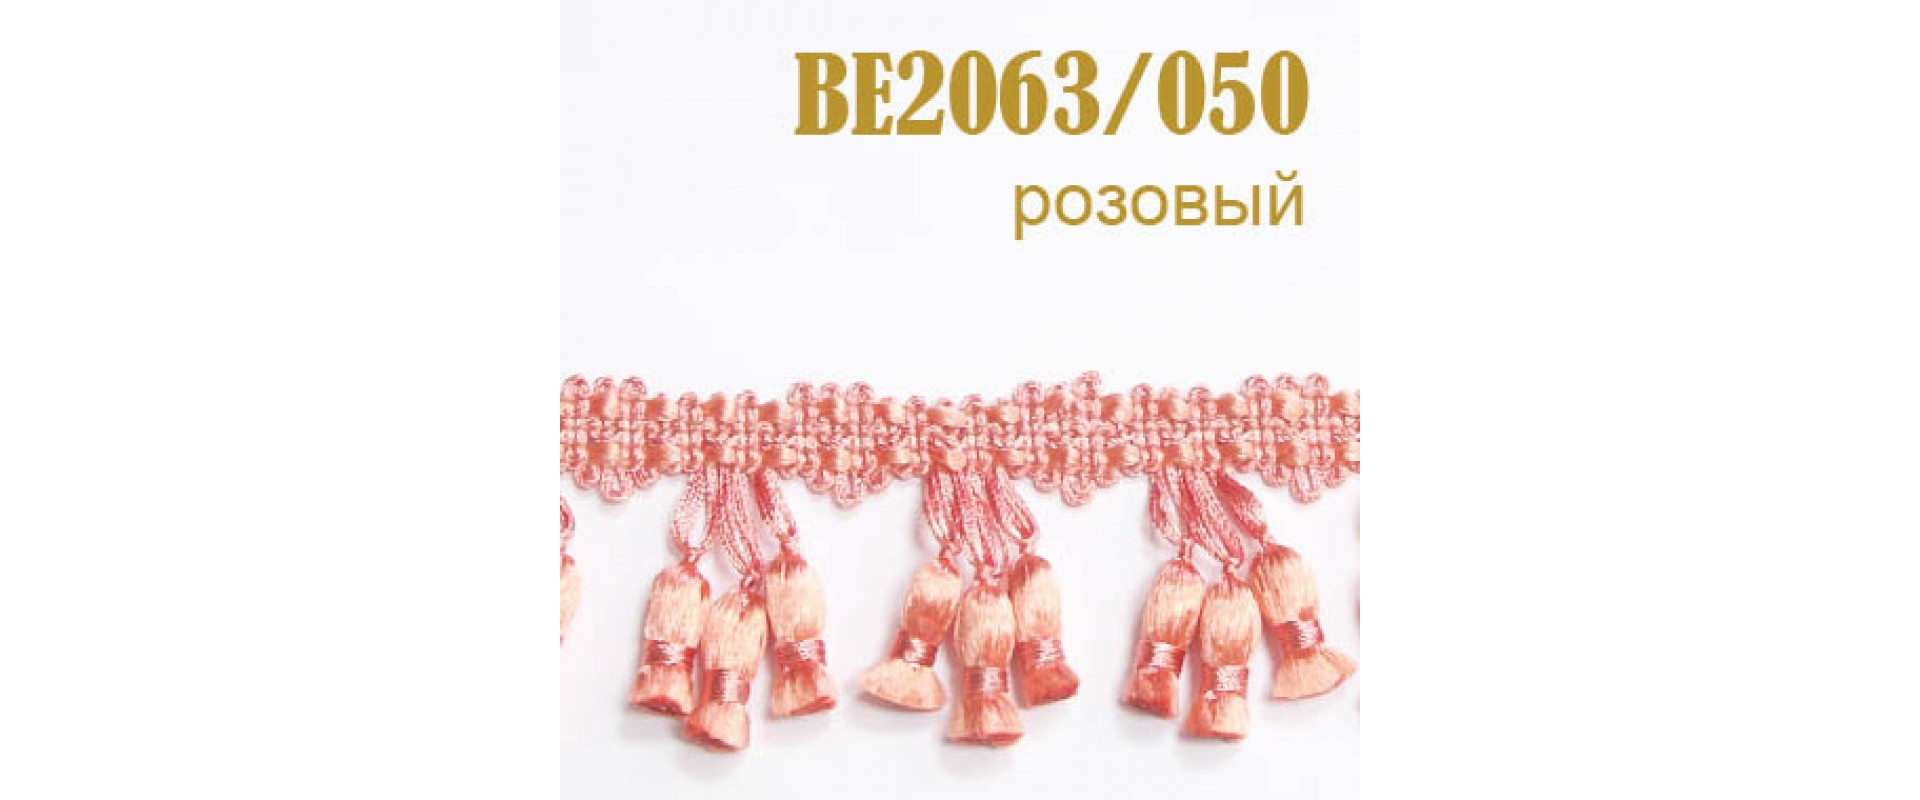 Бахрома для штор AM8073 (BE2063)/050 розовый